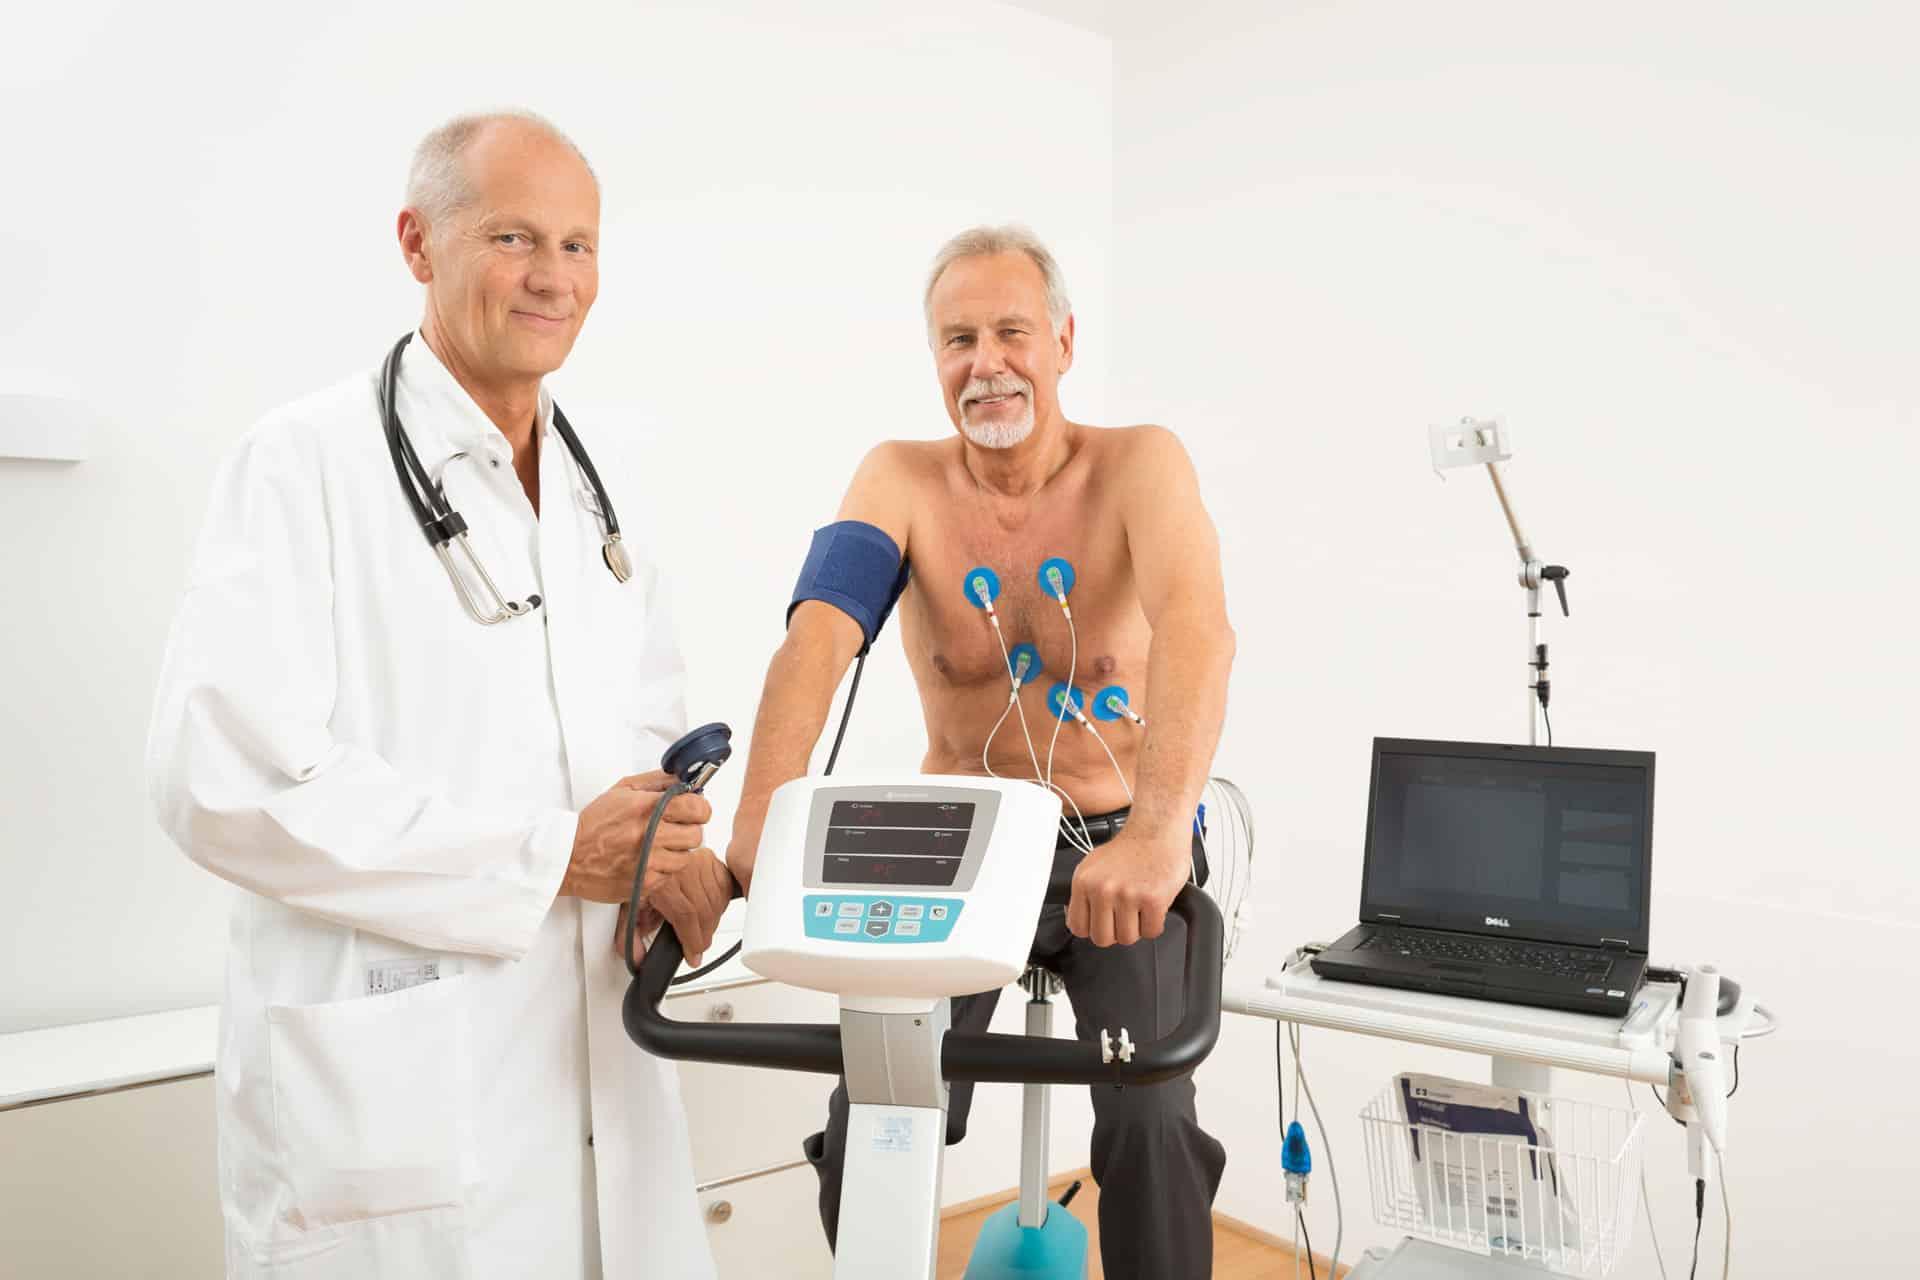 Belastungs-EKG auf dem Fahrradergometer